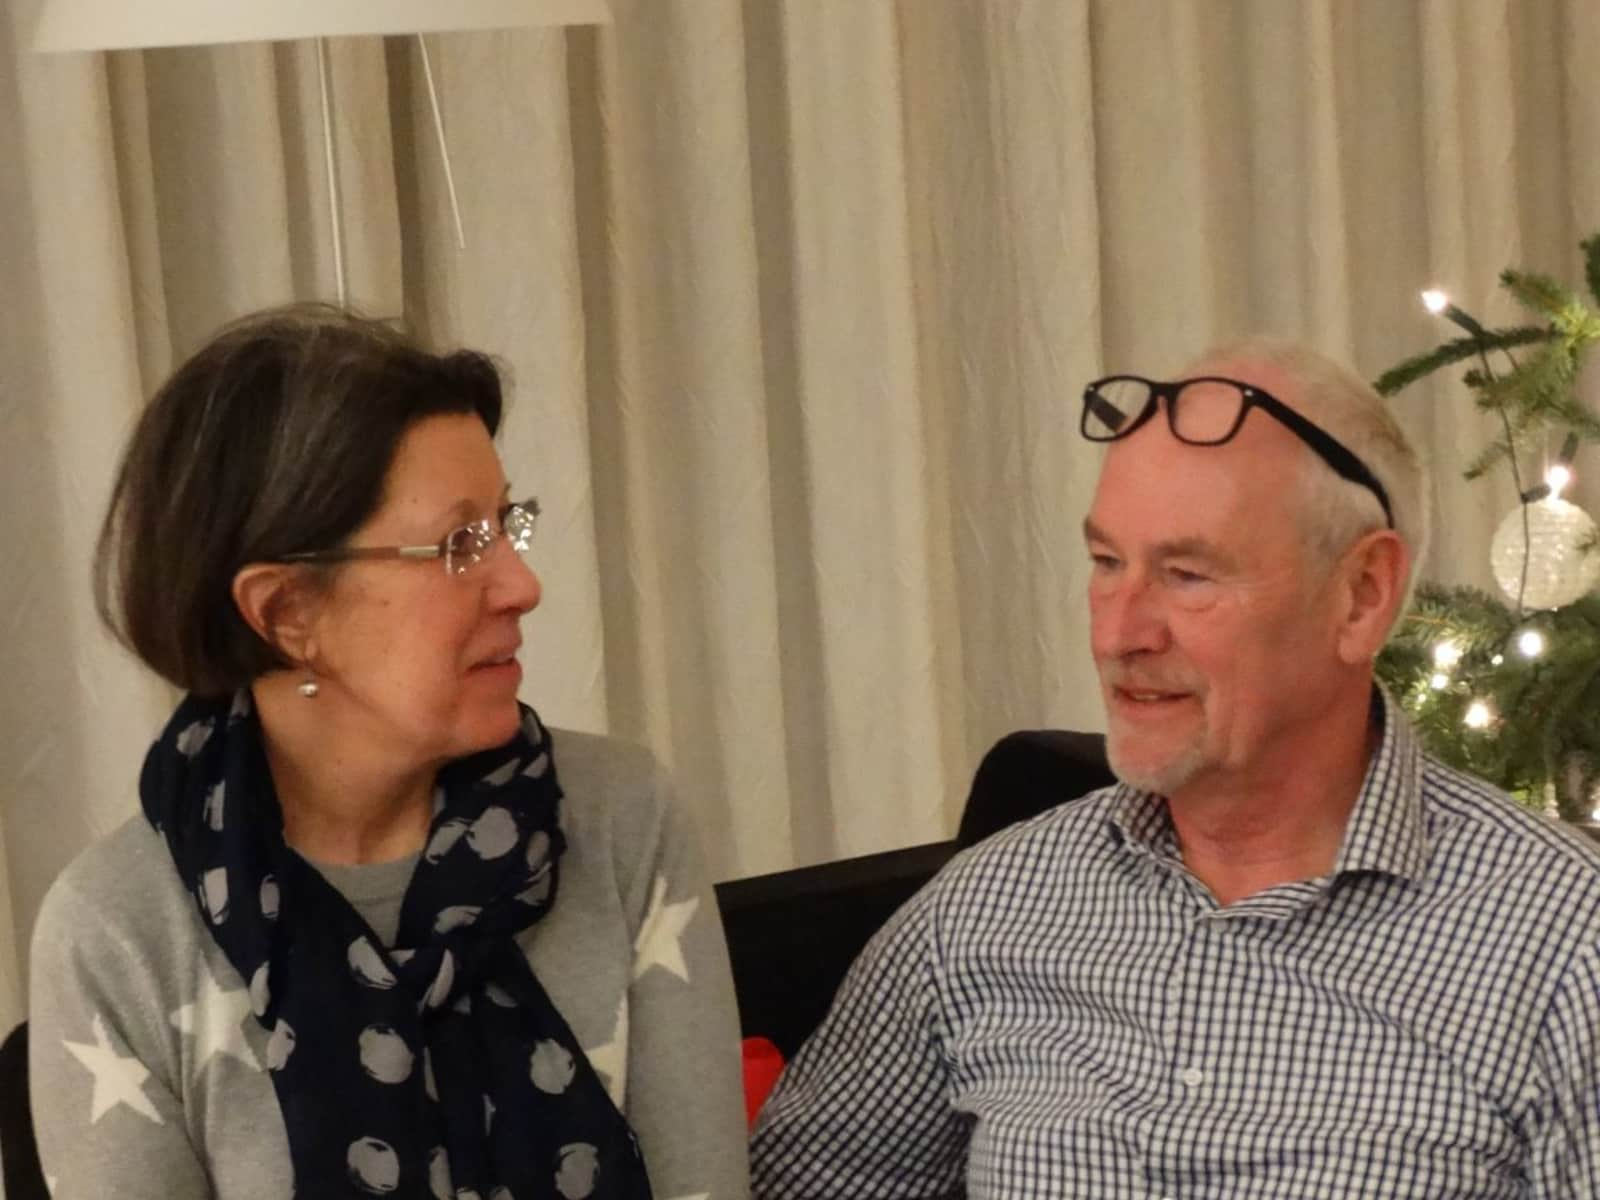 Patrick & Ingrid from Brugge, Belgium